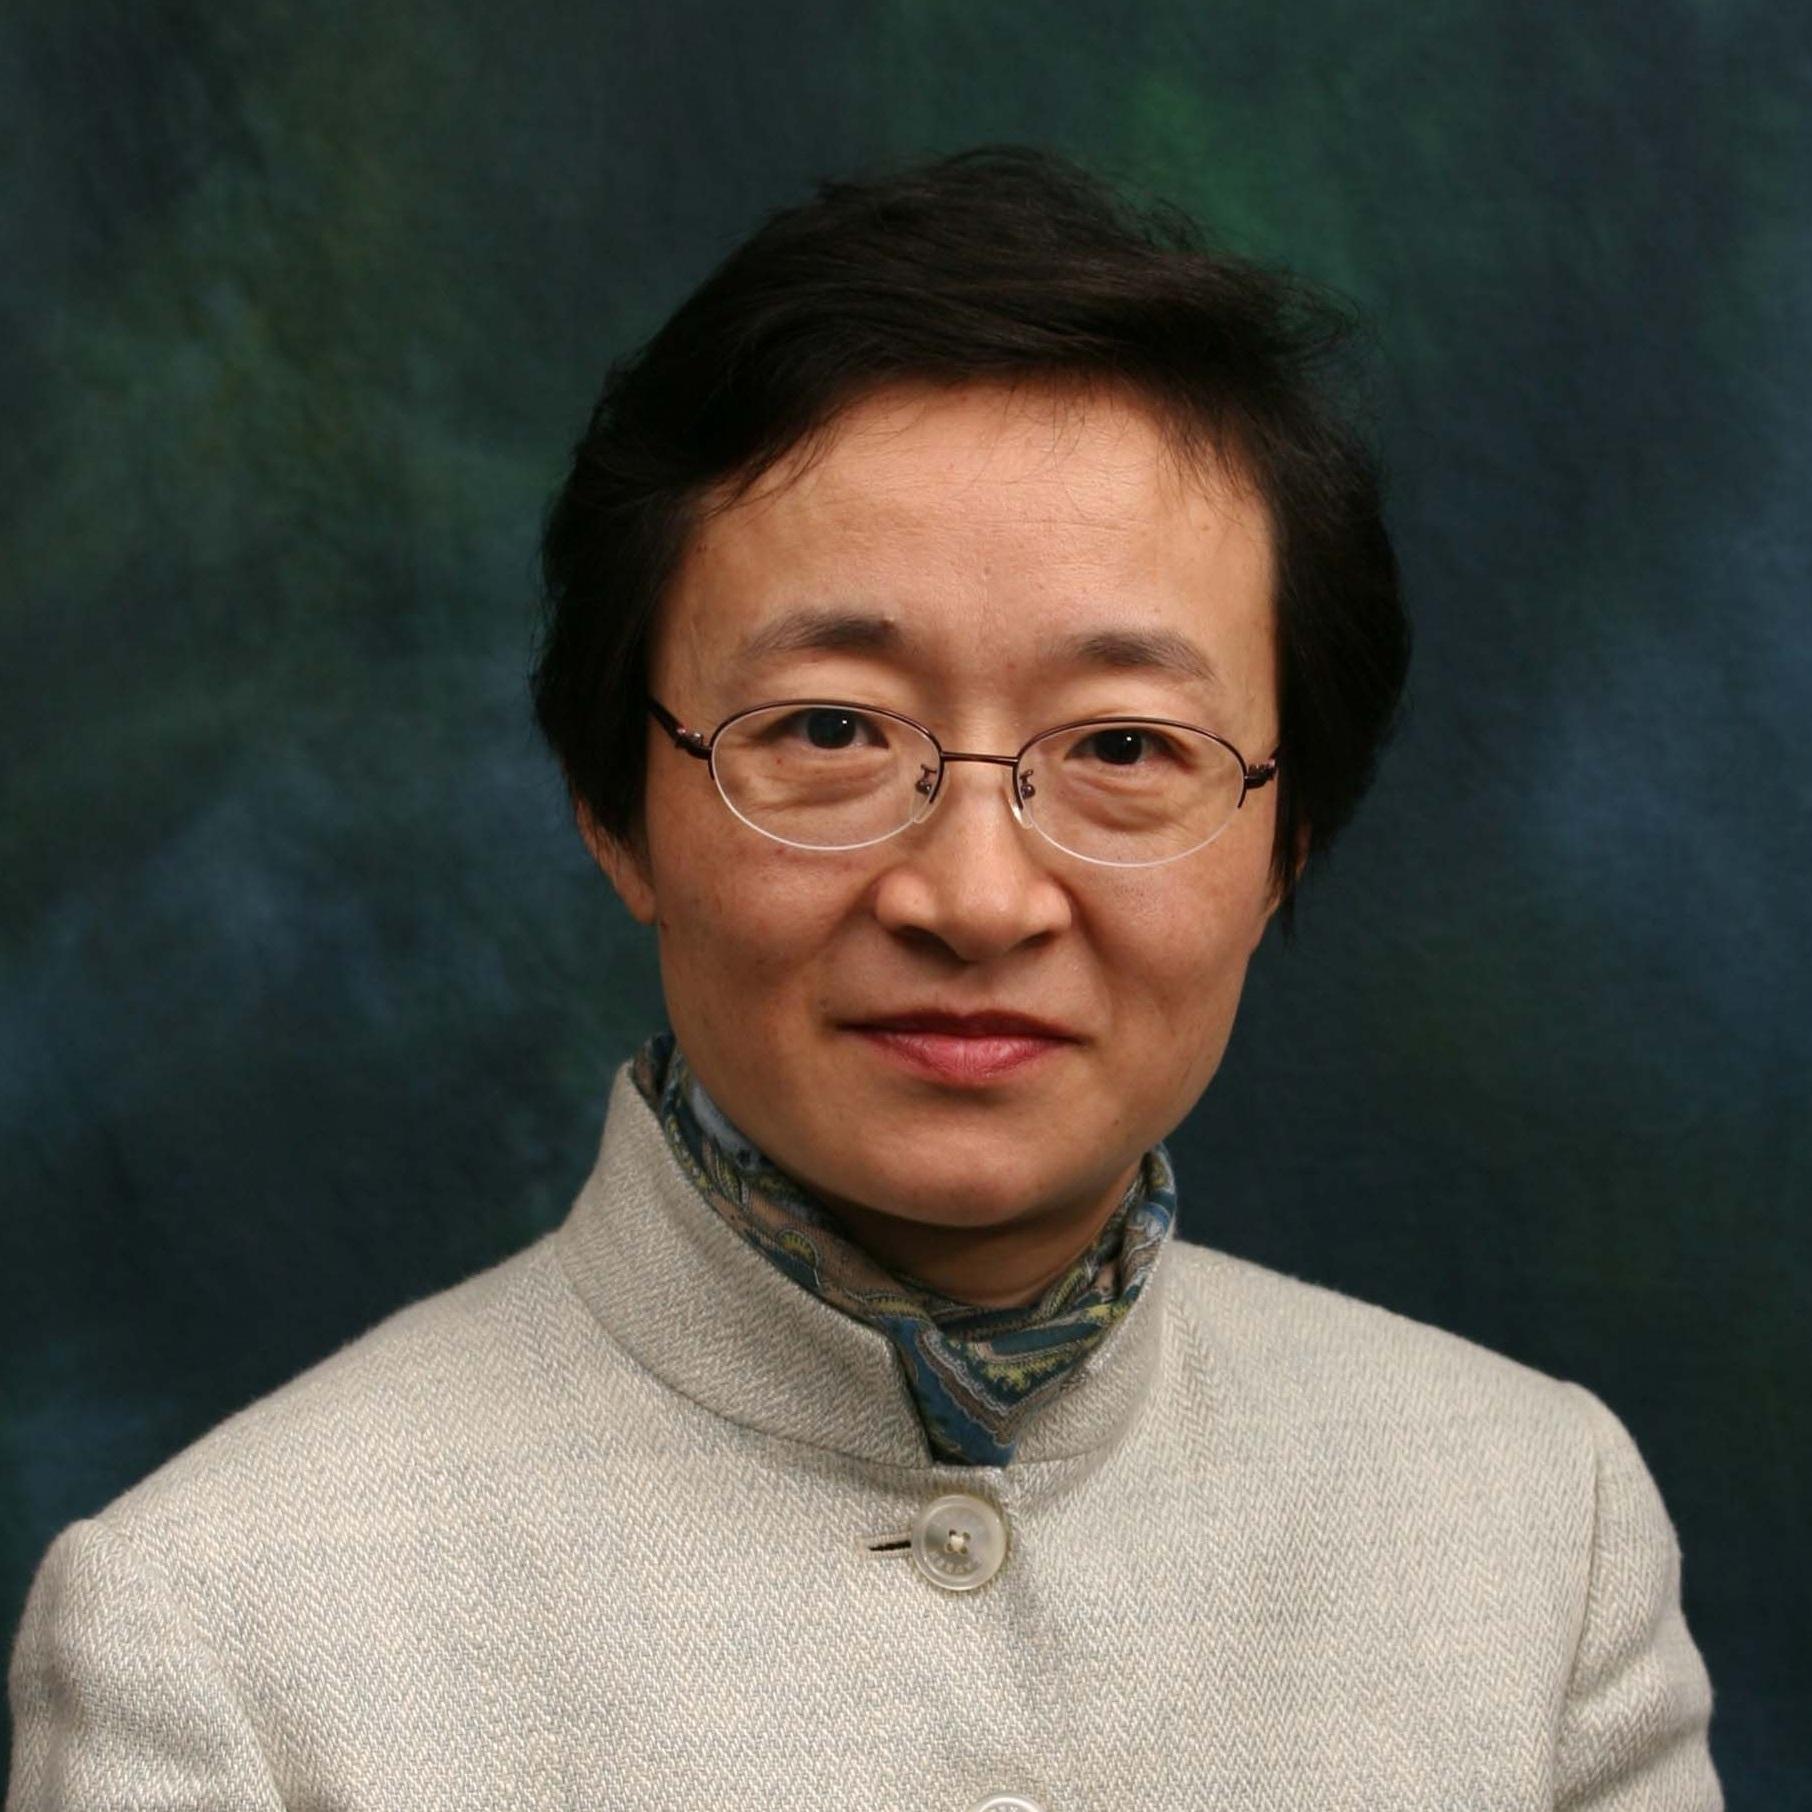 qin lu - computer science professor, hk polytechnic university